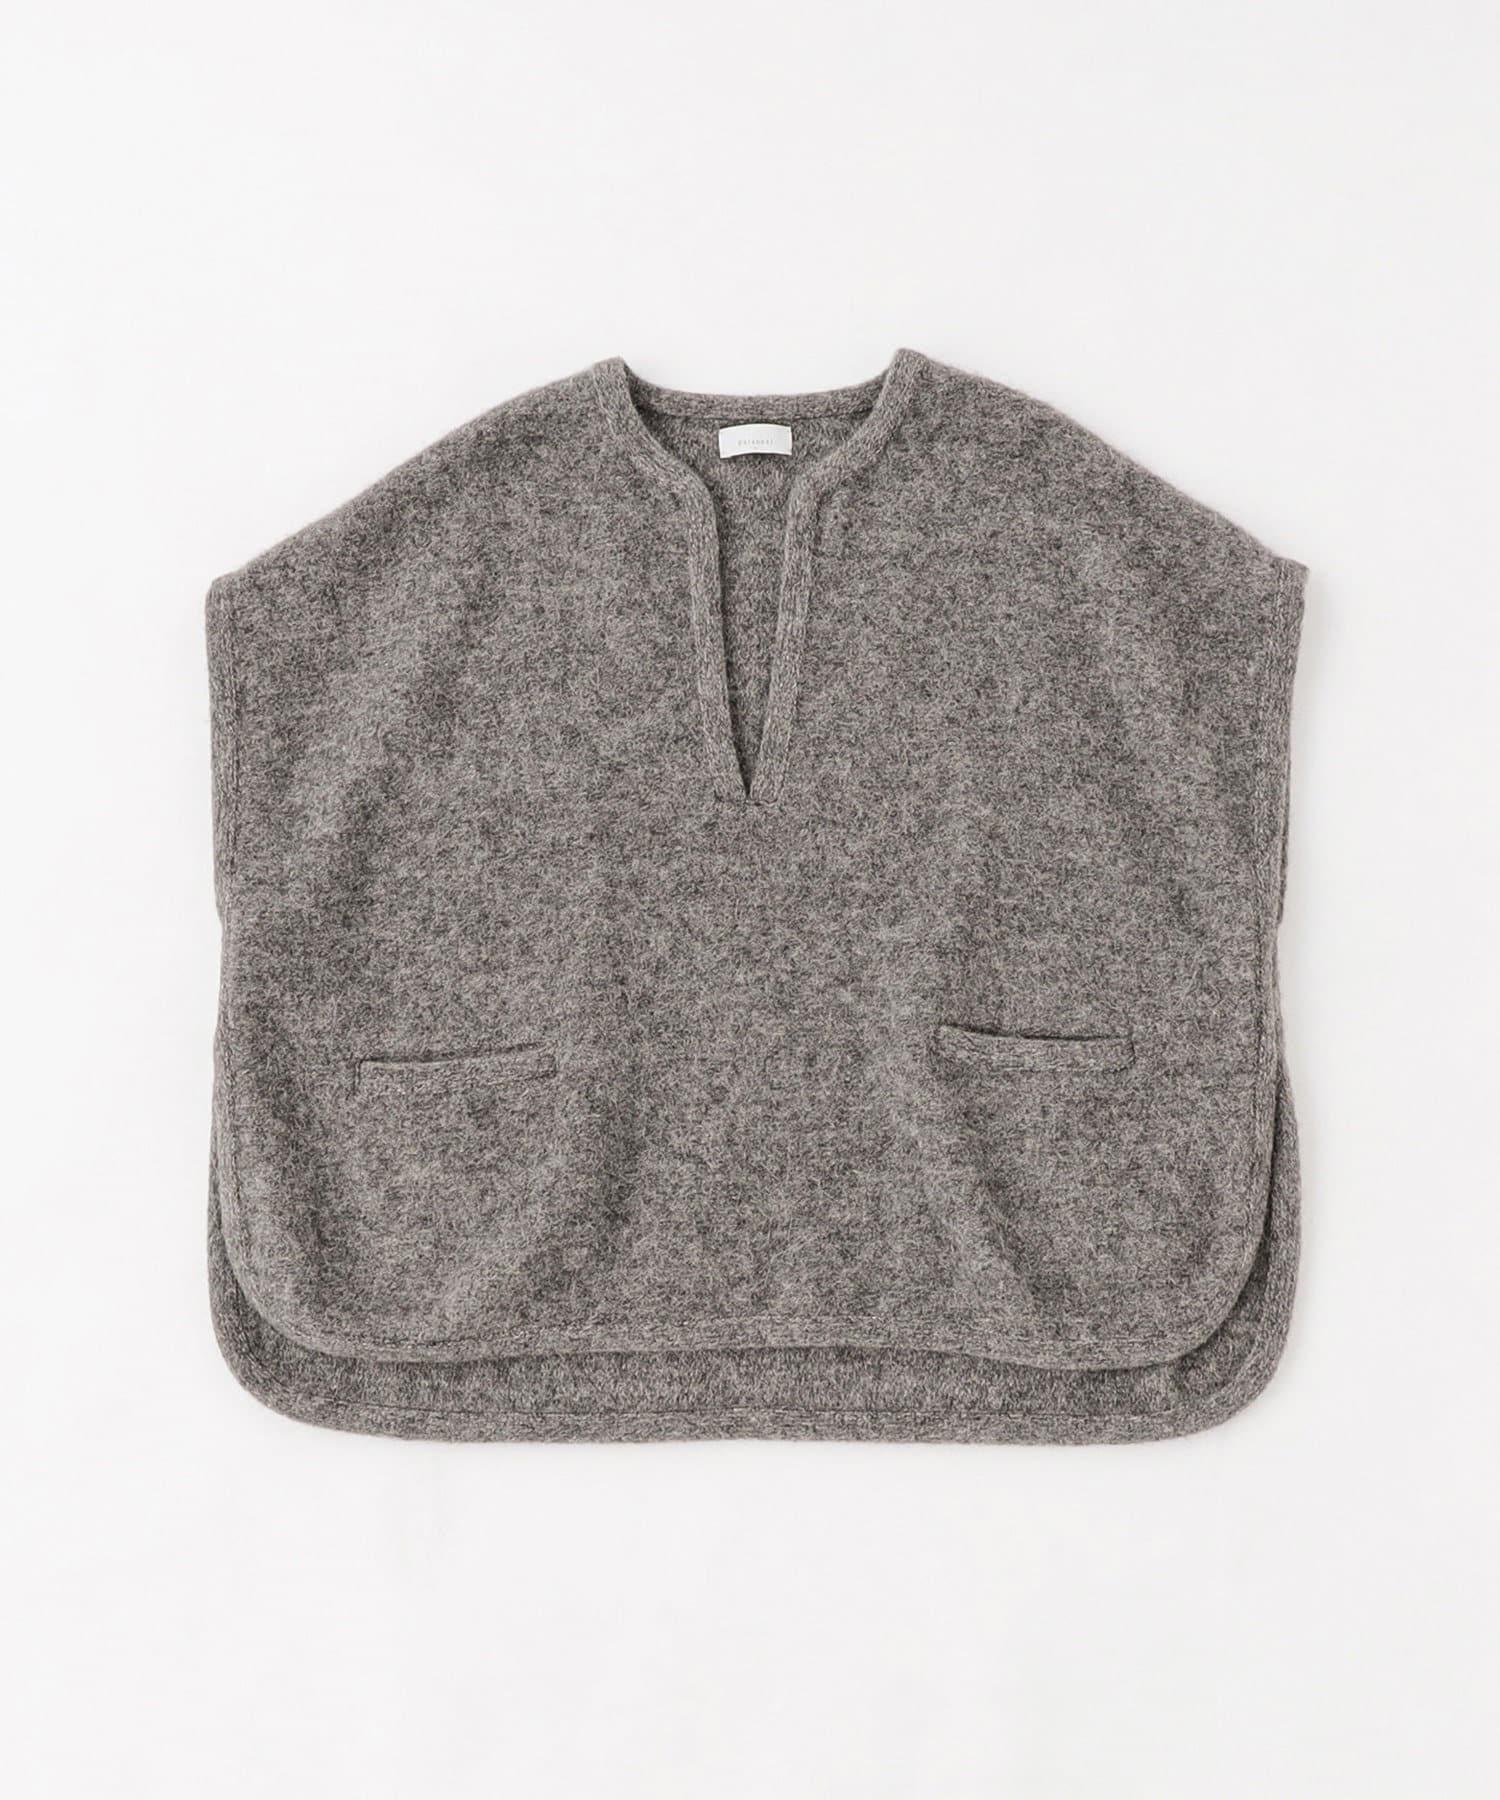 BLOOM&BRANCH(ブルームアンドブランチ) Phlannèl / Felt Wool Knit Poncho